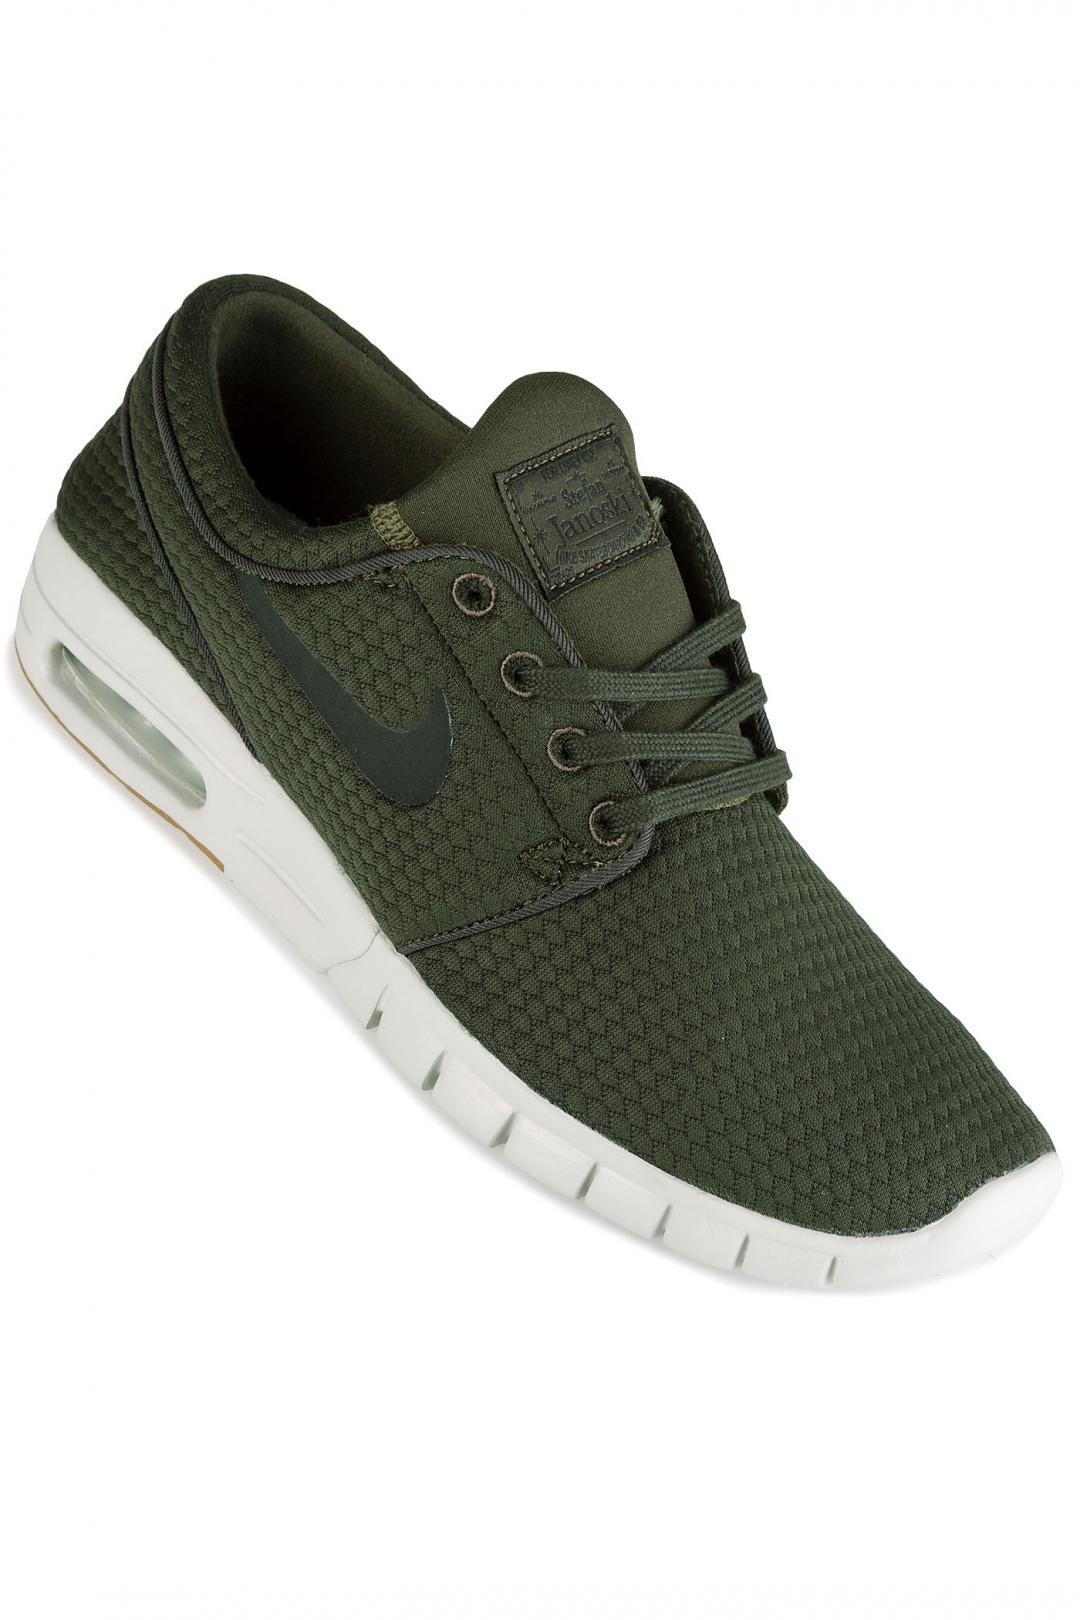 Uomo Nike SB Stefan Janoski Max sequoia black | Sneakers low top